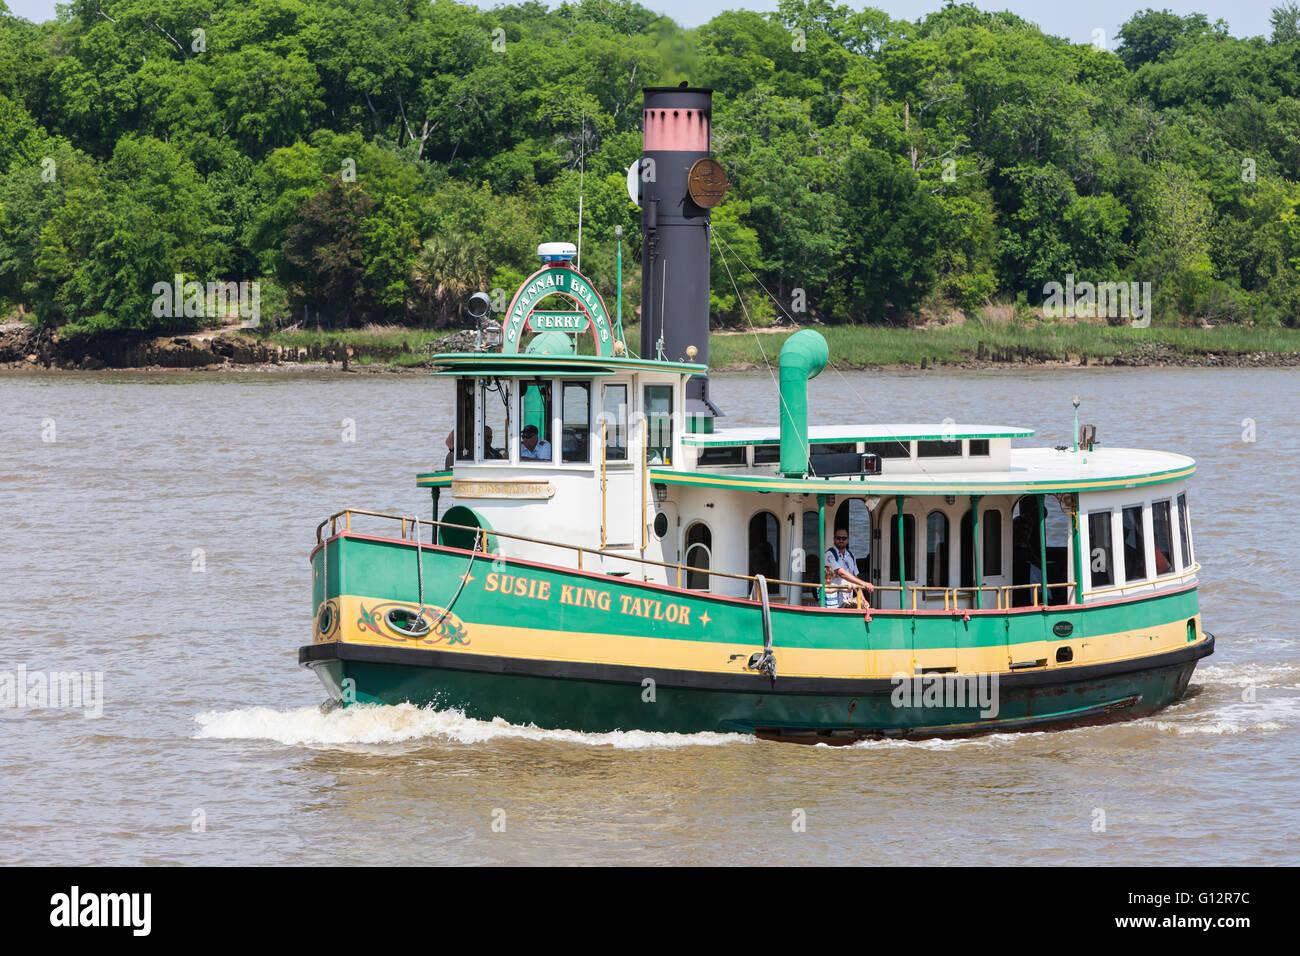 Savannah Belles bateau 'Susie King Taylor' traverse la rivière Savannah à Savannah, Géorgie. Photo Stock